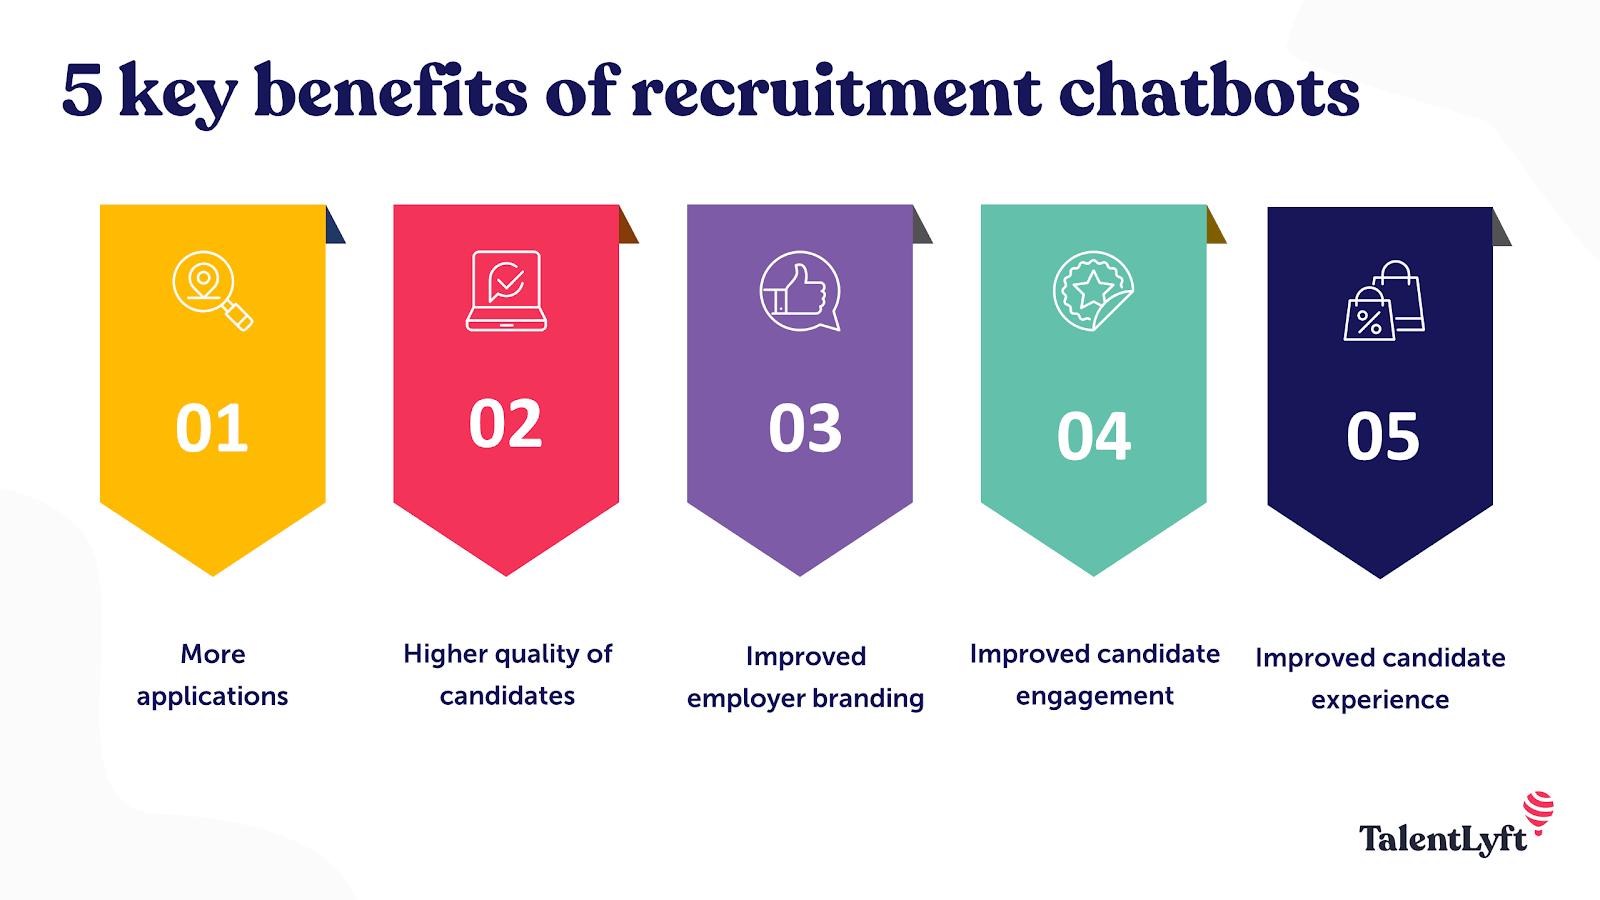 Benefits of recruitment chatbots